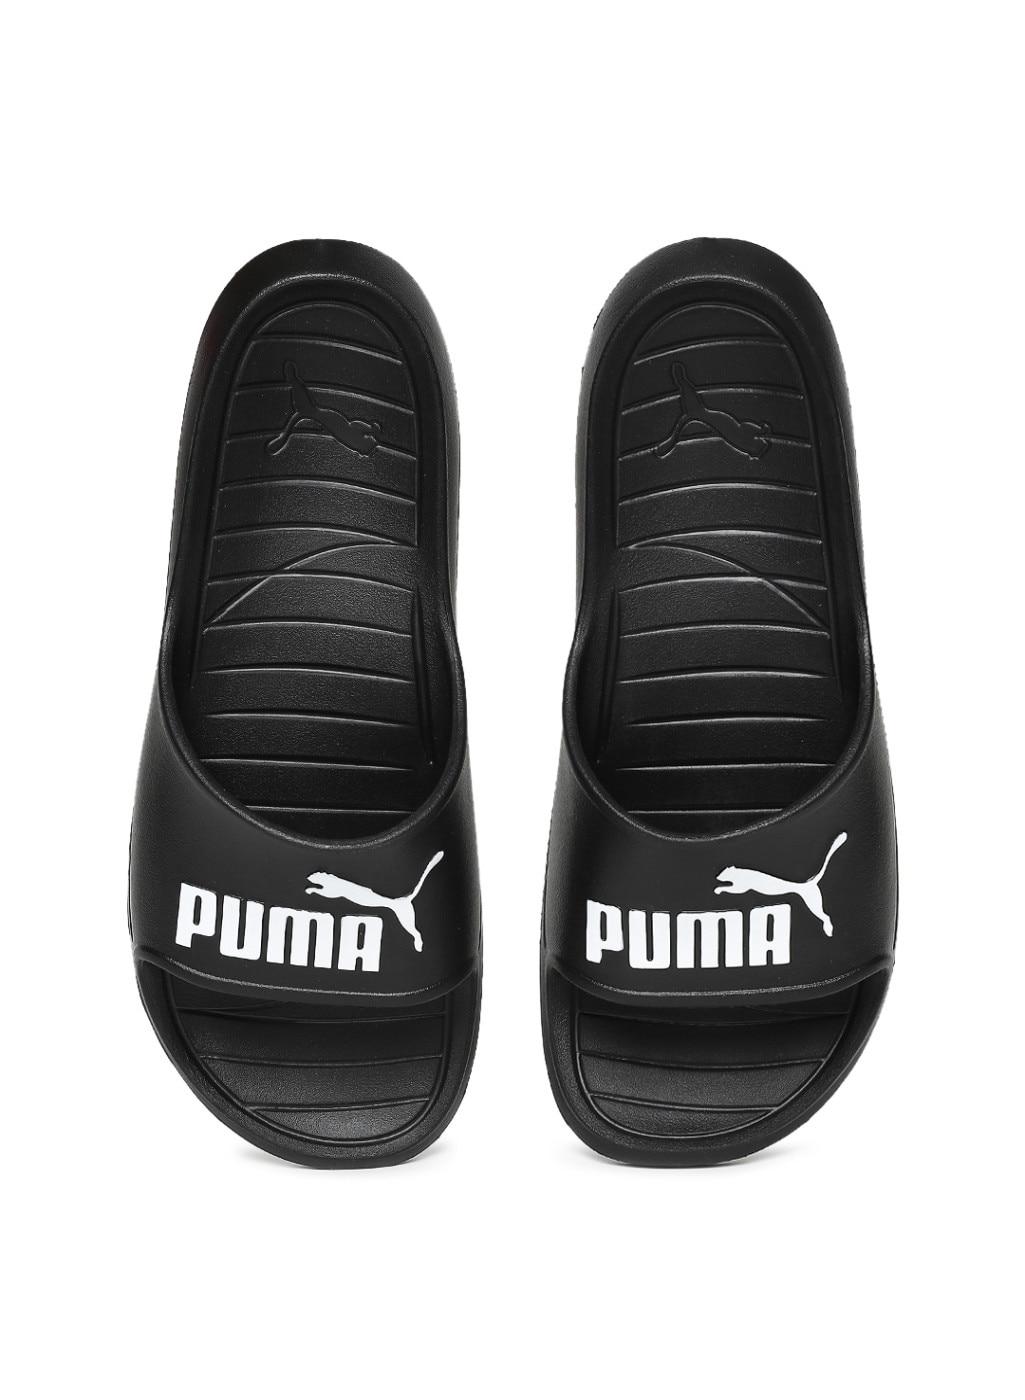 premium selection 25430 c670d 3555d1 peach black women flip flops puma svanik g id w msc ...